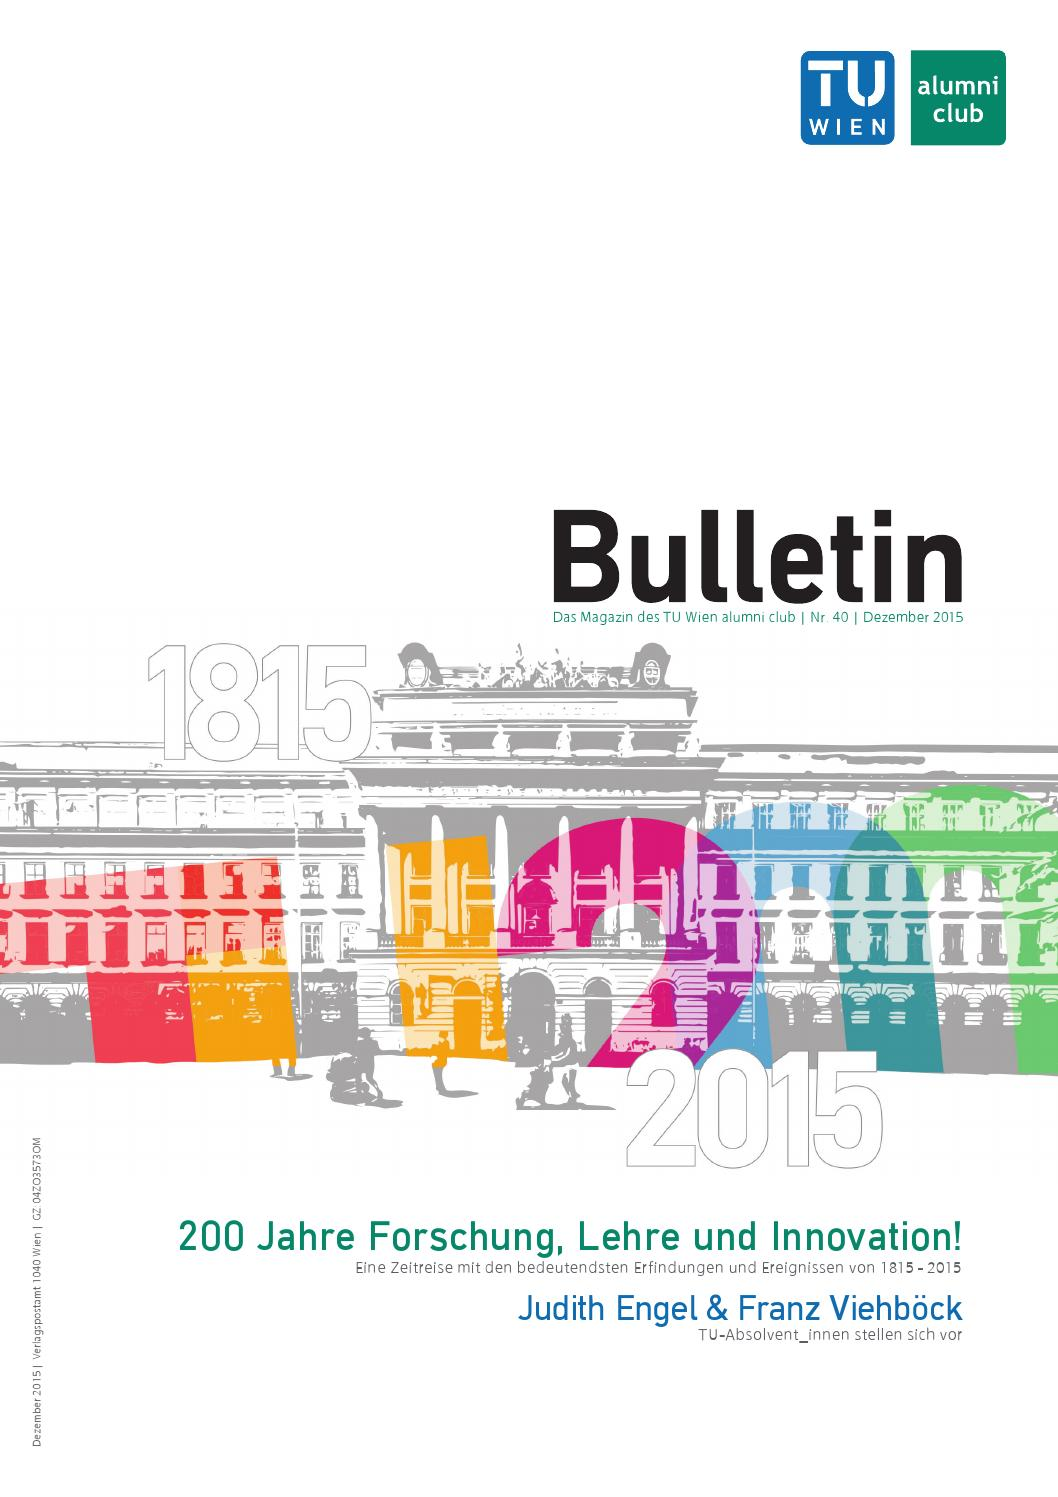 TU Wien alumni club Bulletin 40 by TU Wien alumni club - issuu